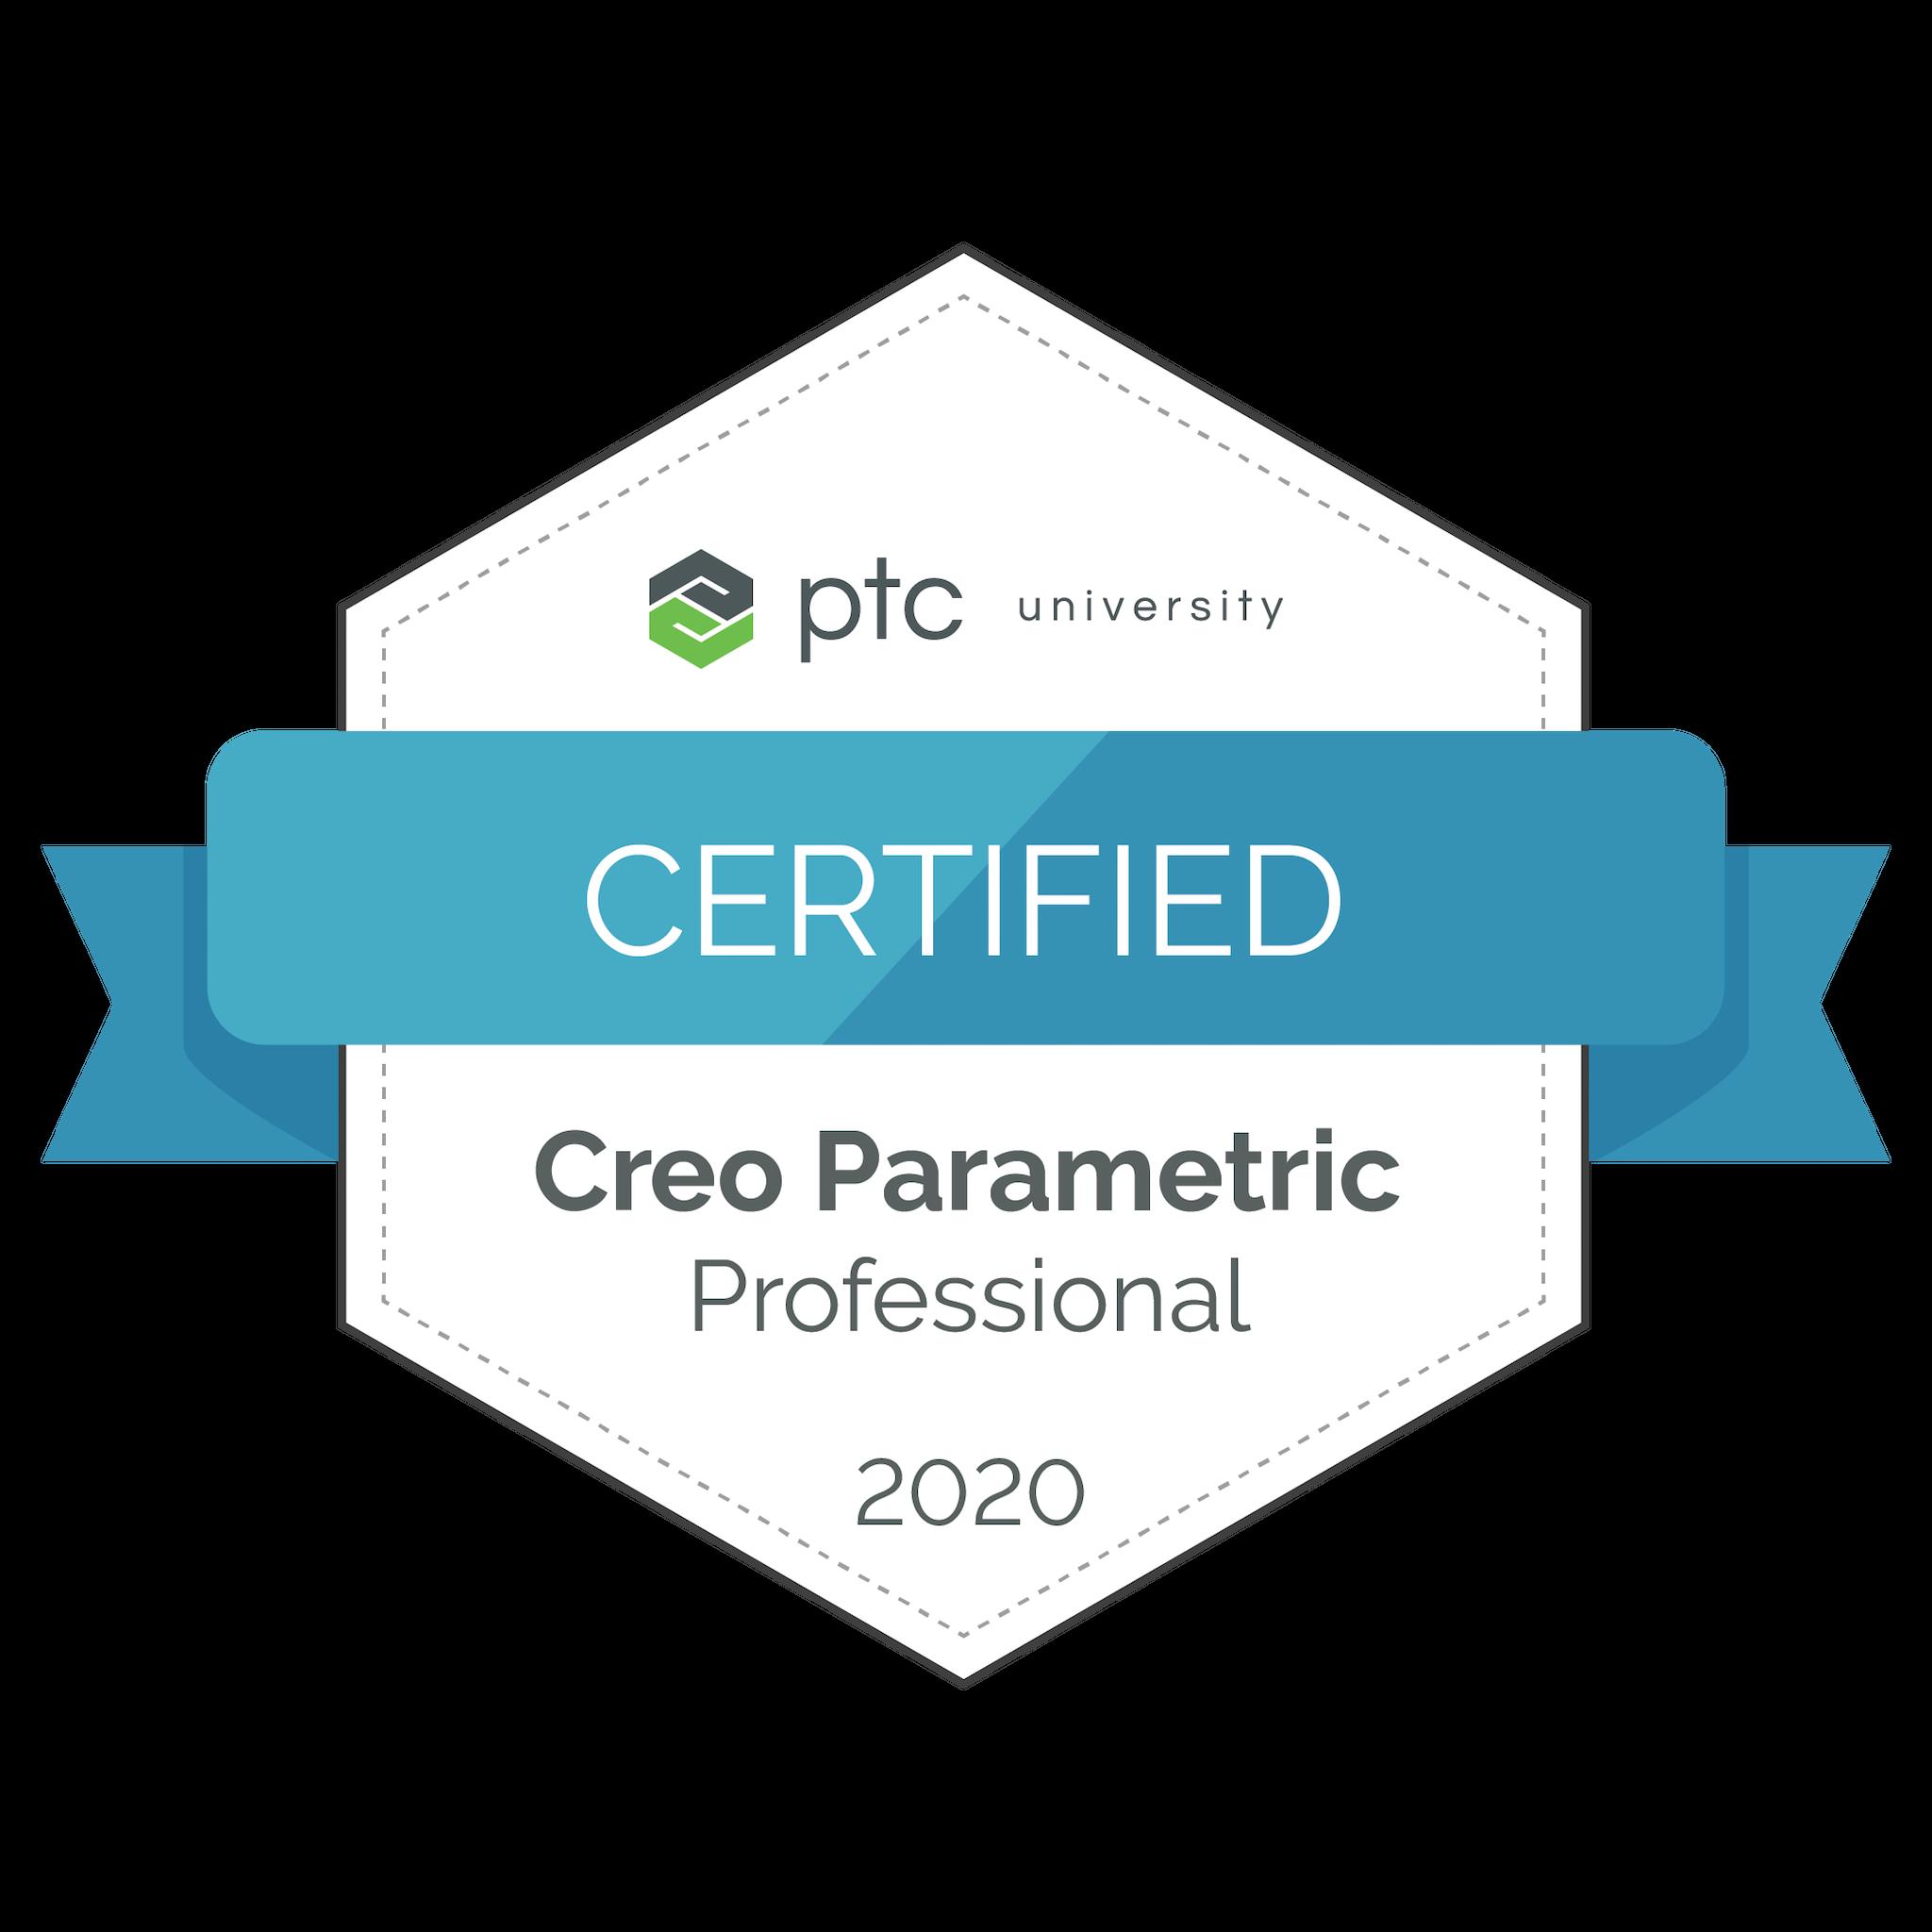 Creo Parametric Professional Certification 2020